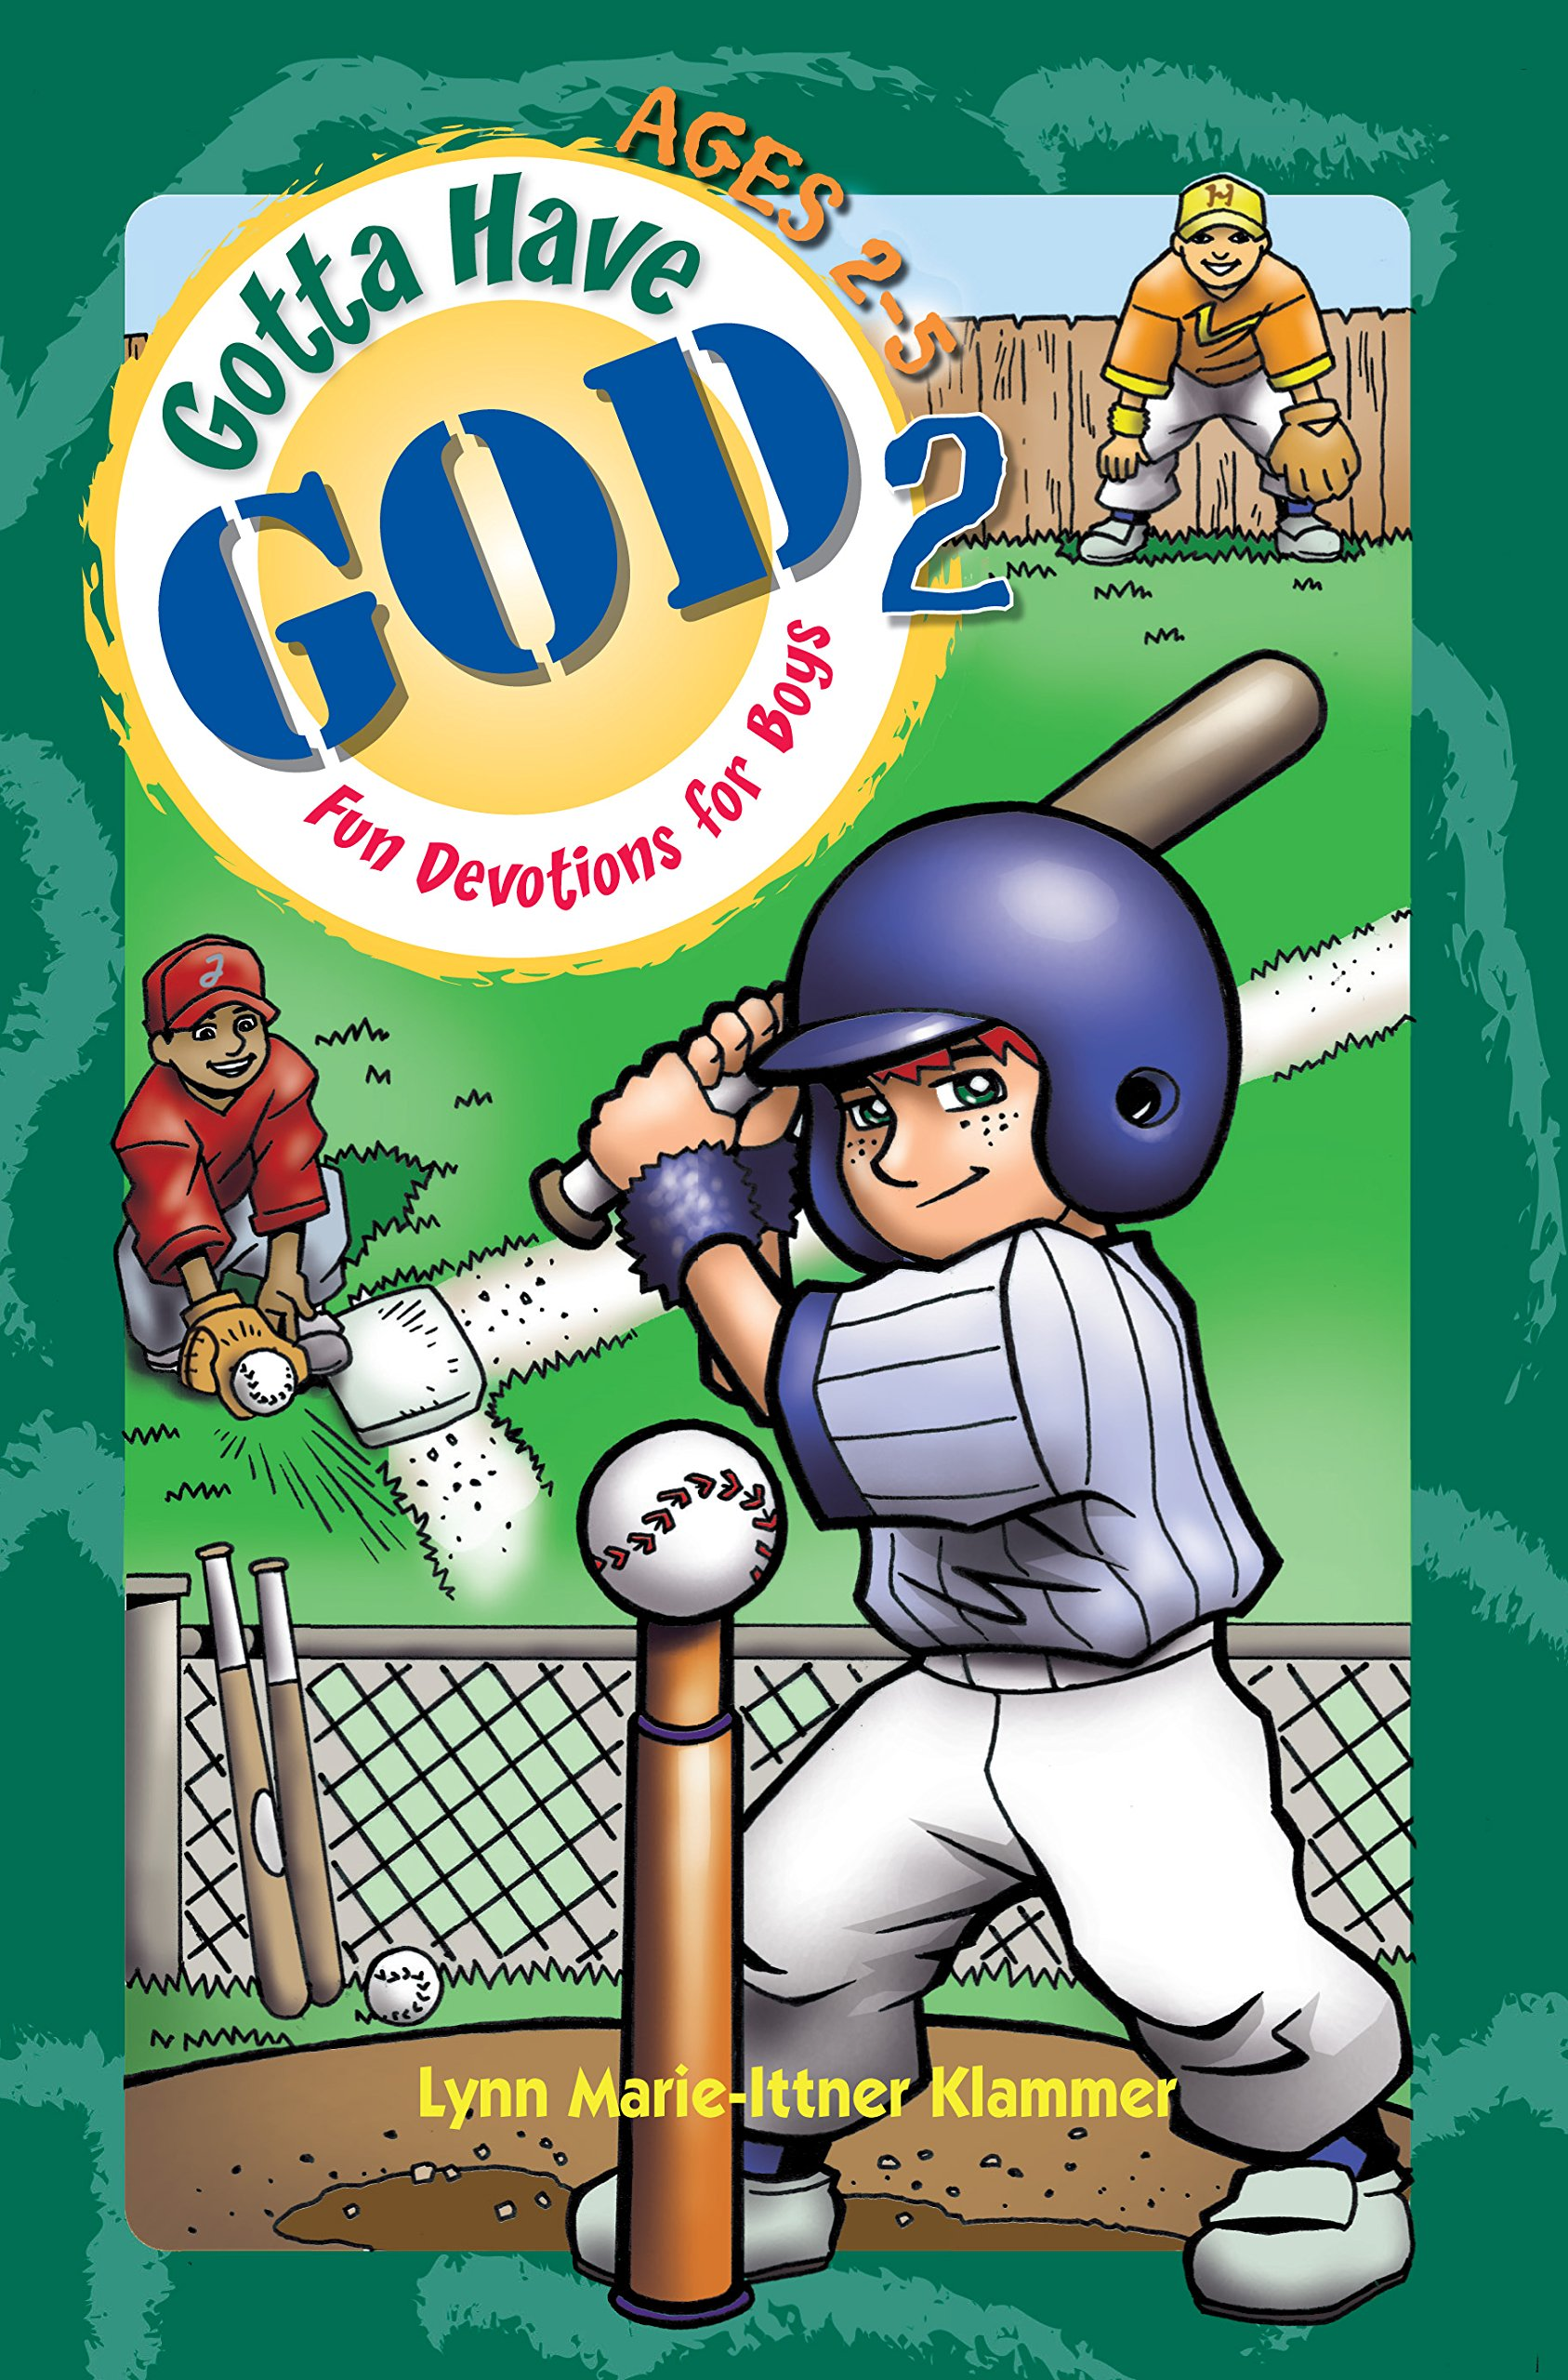 Gotta Have God Boys Devotional Vol 2 -- Ages 2-5: Lynn Klammer, RoseKidz:  9781584110576: Amazon.com: Books